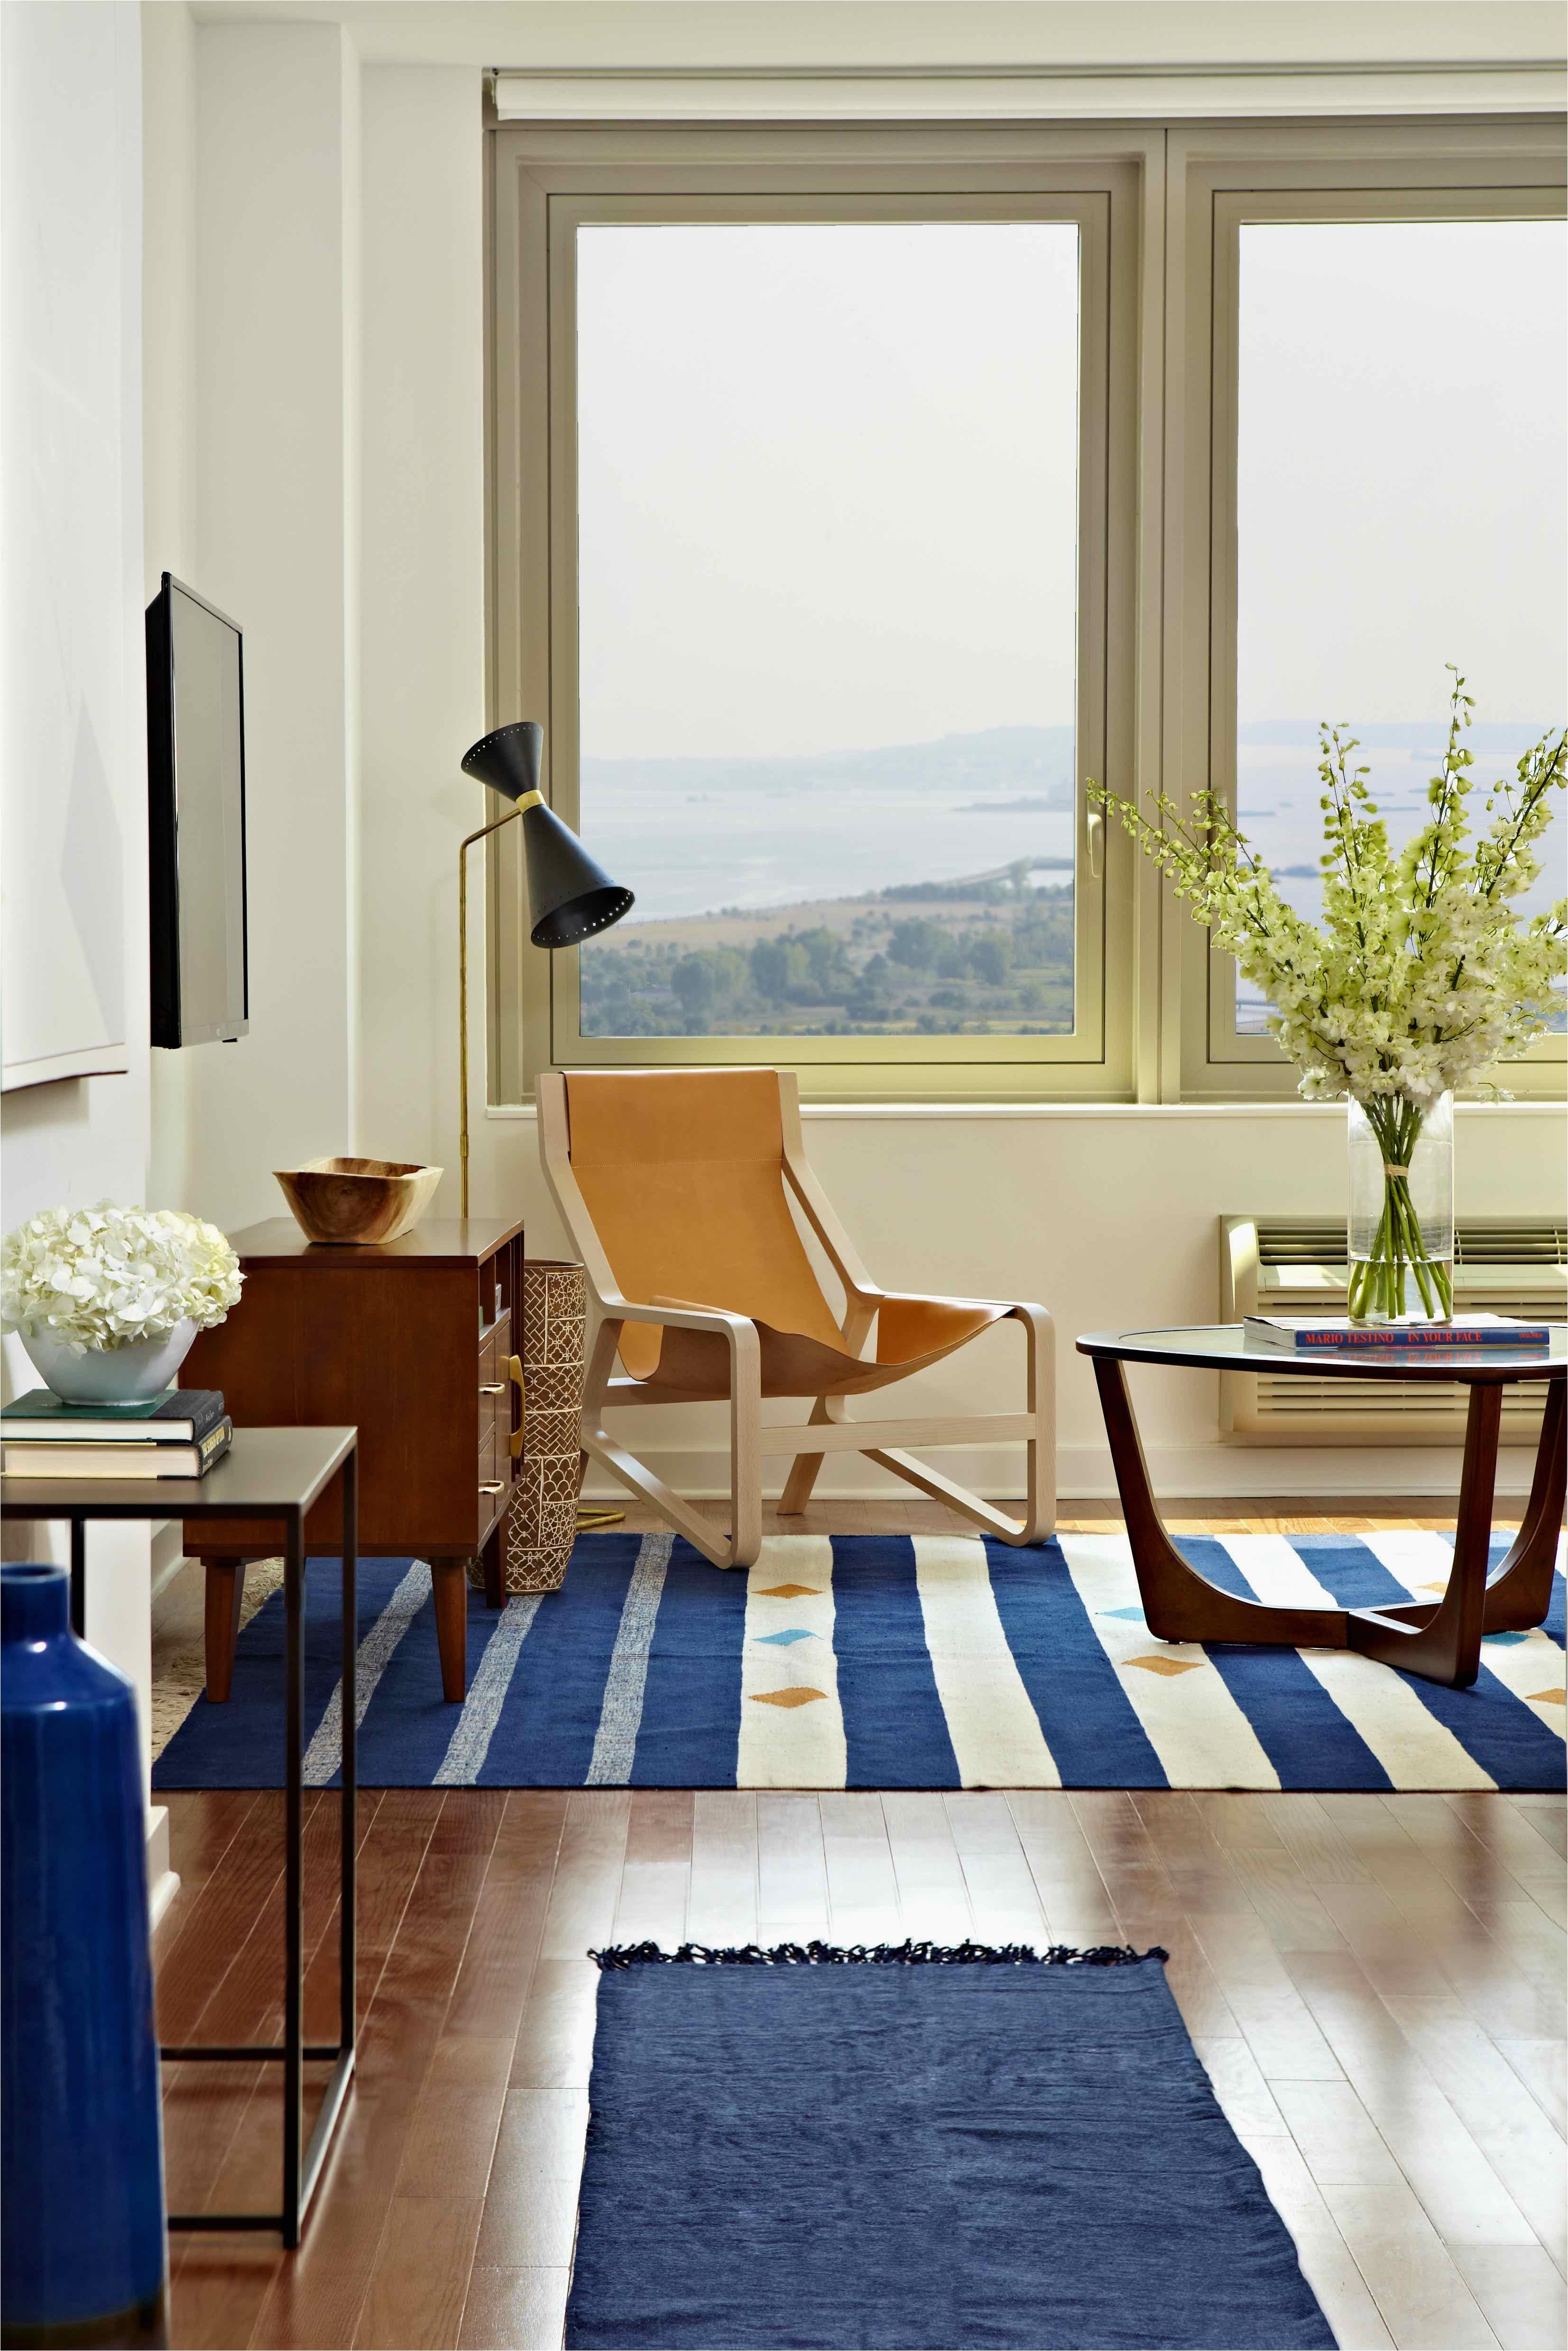 craigslist miami furniture for sale by owner inspirational craigslist 2 bedroom apartment bedroom image of craigslist